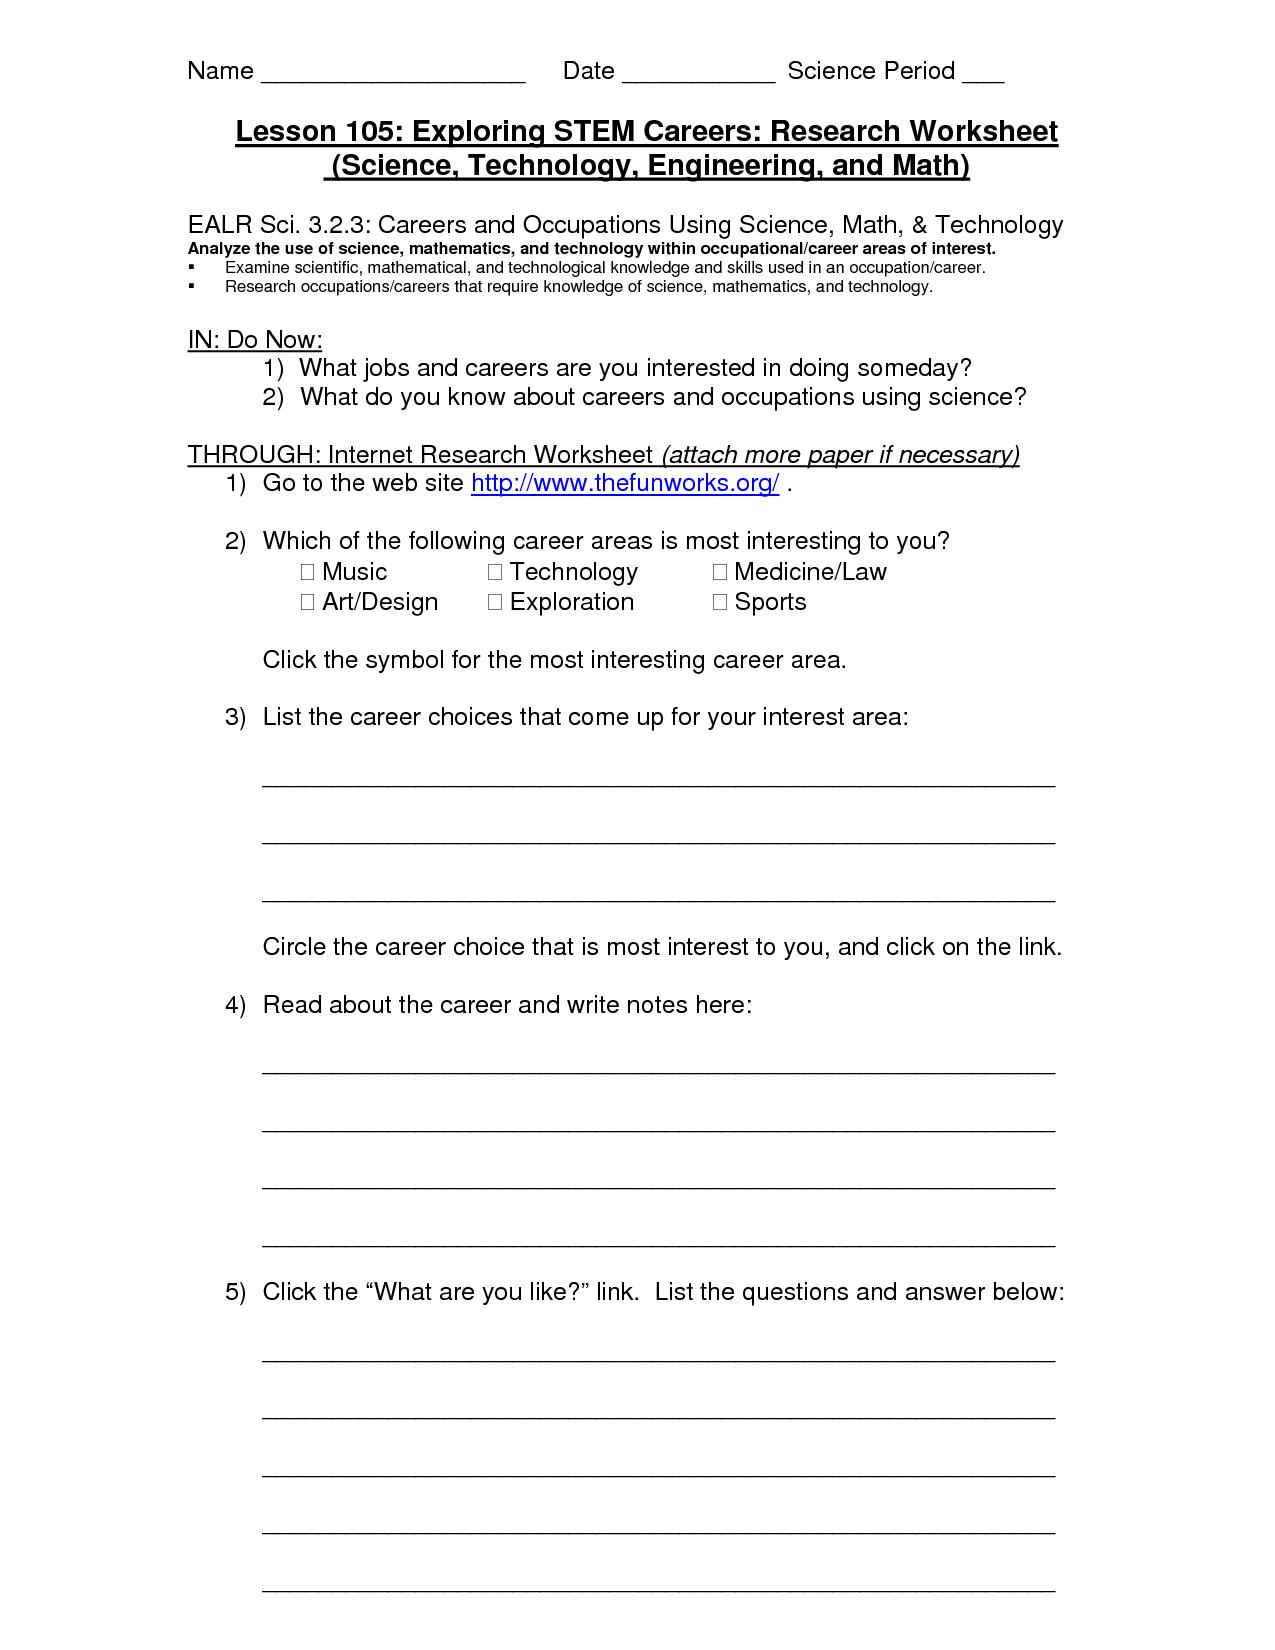 35 Research Worksheet Middle School   Worksheet Resource Plans